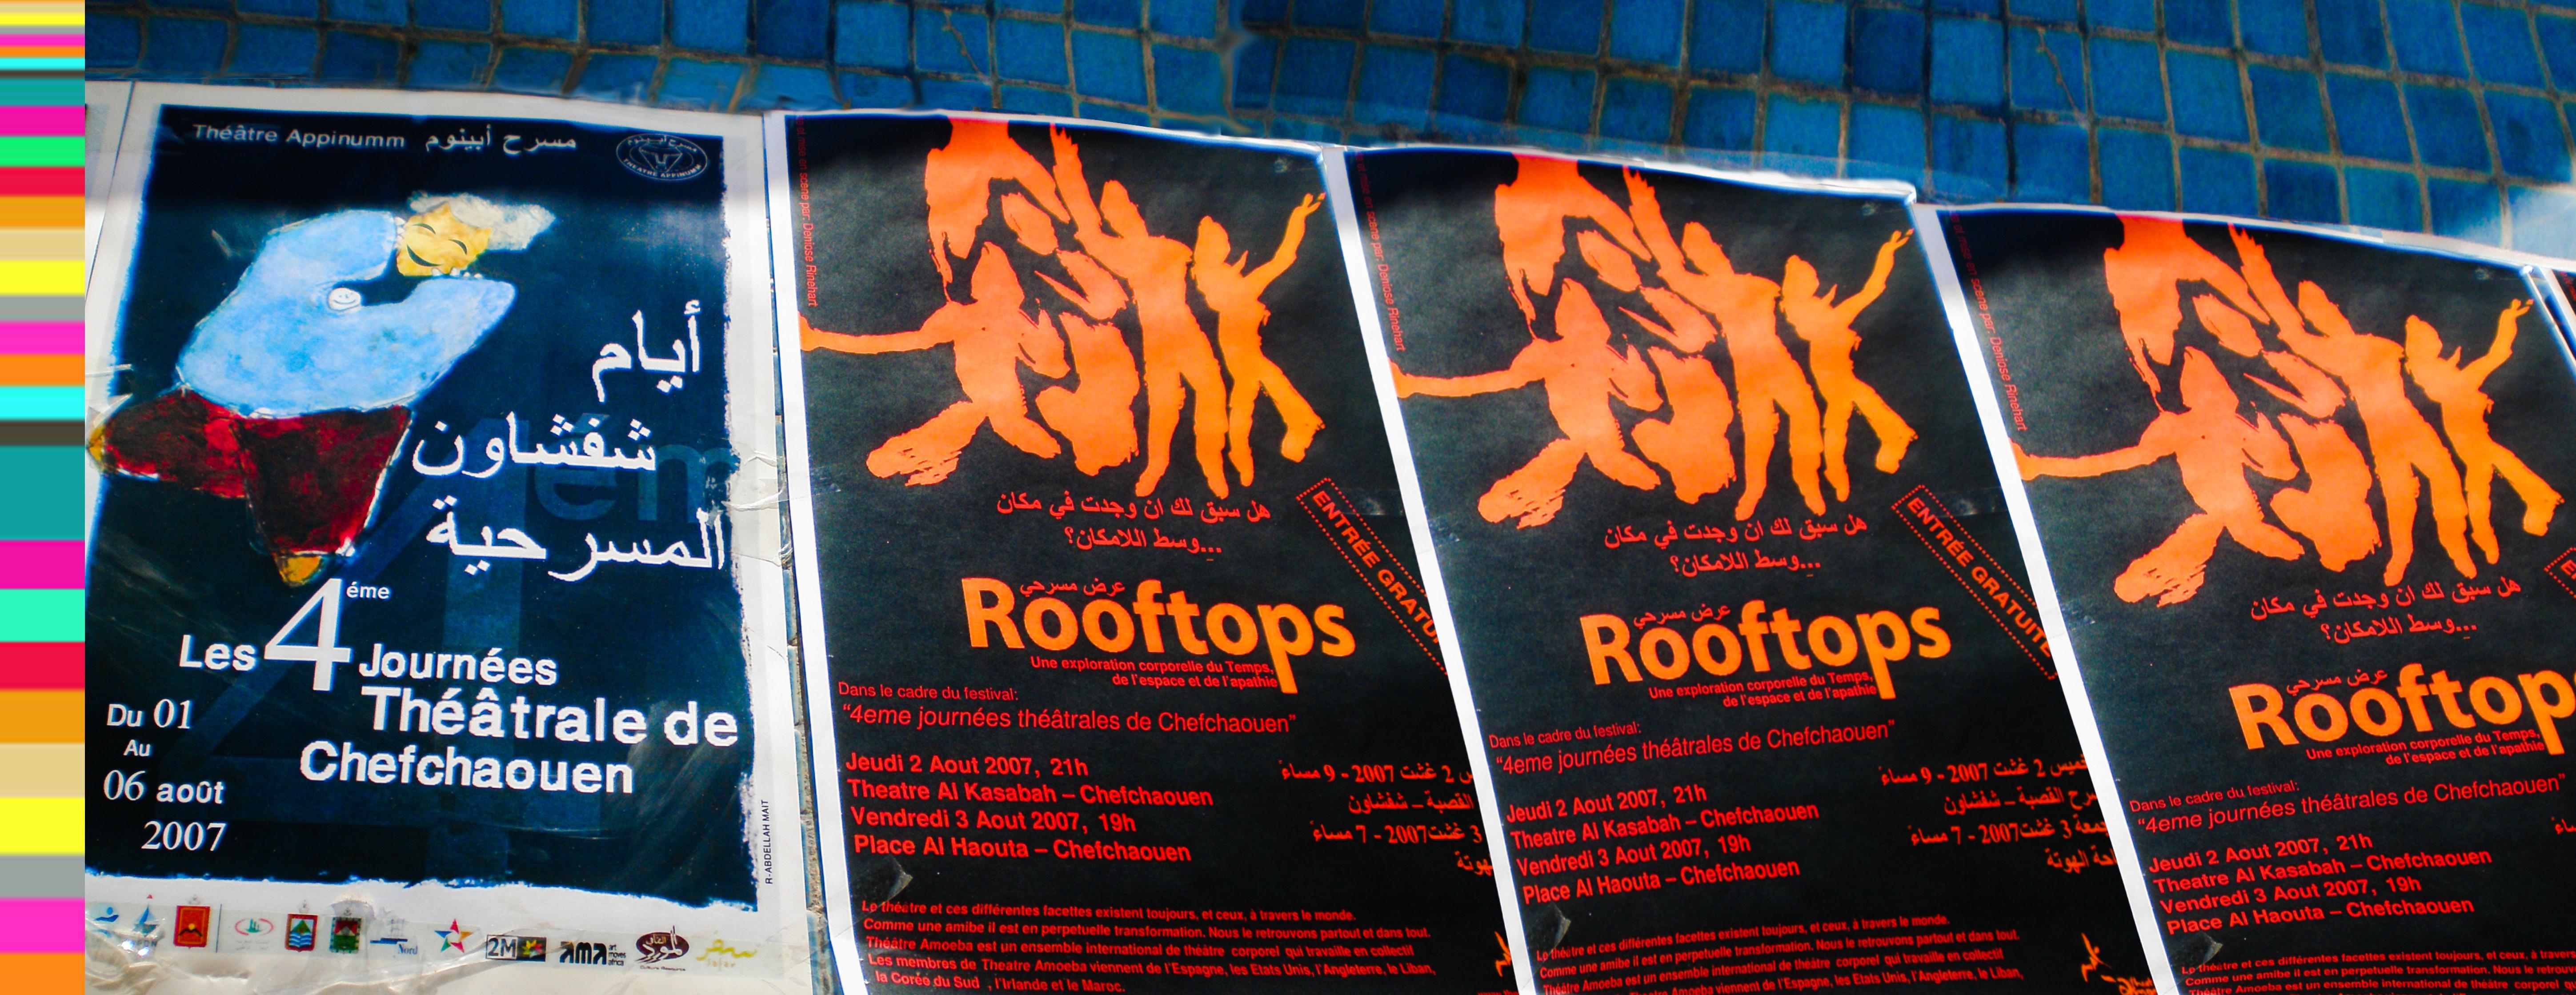 Moroccoamoeba colorstrip rooftops.jpg